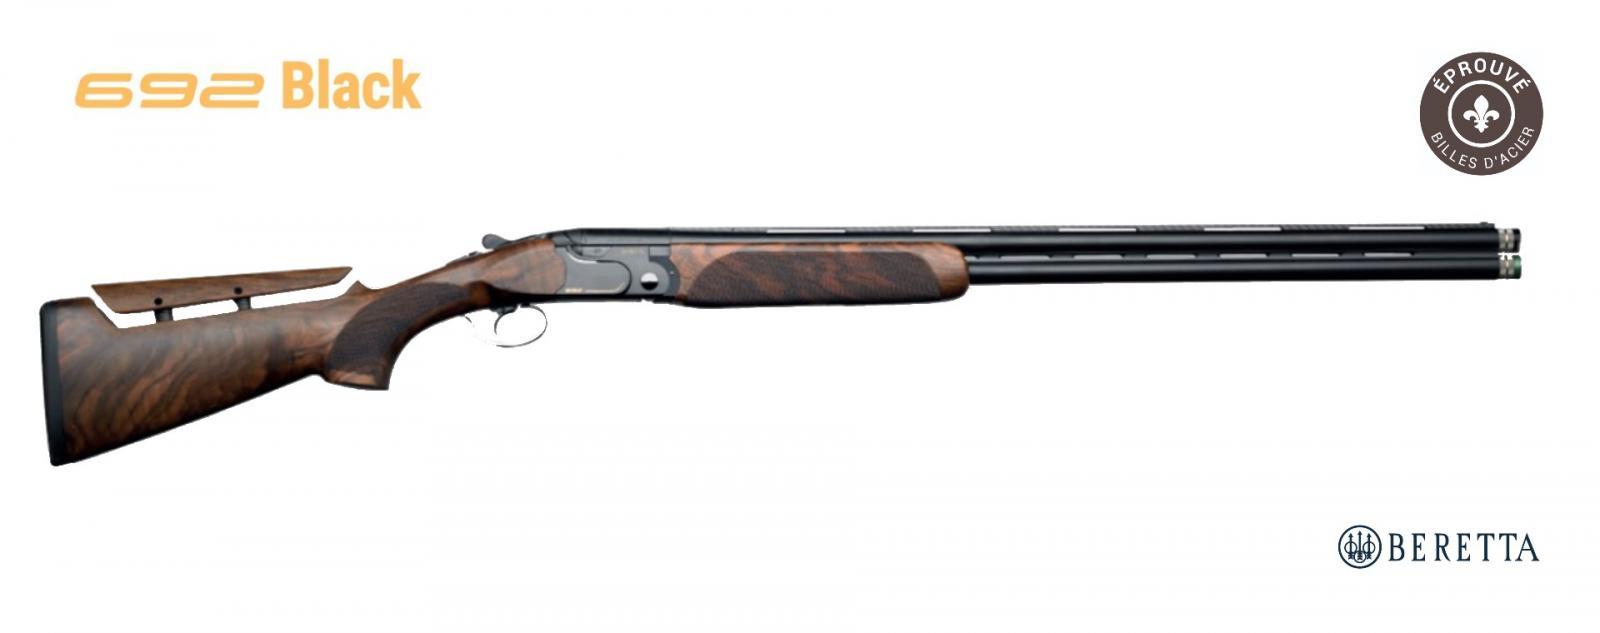 Fusil superposé BERETTA 692 Black Édition SPORTING B-FAST Canon 76